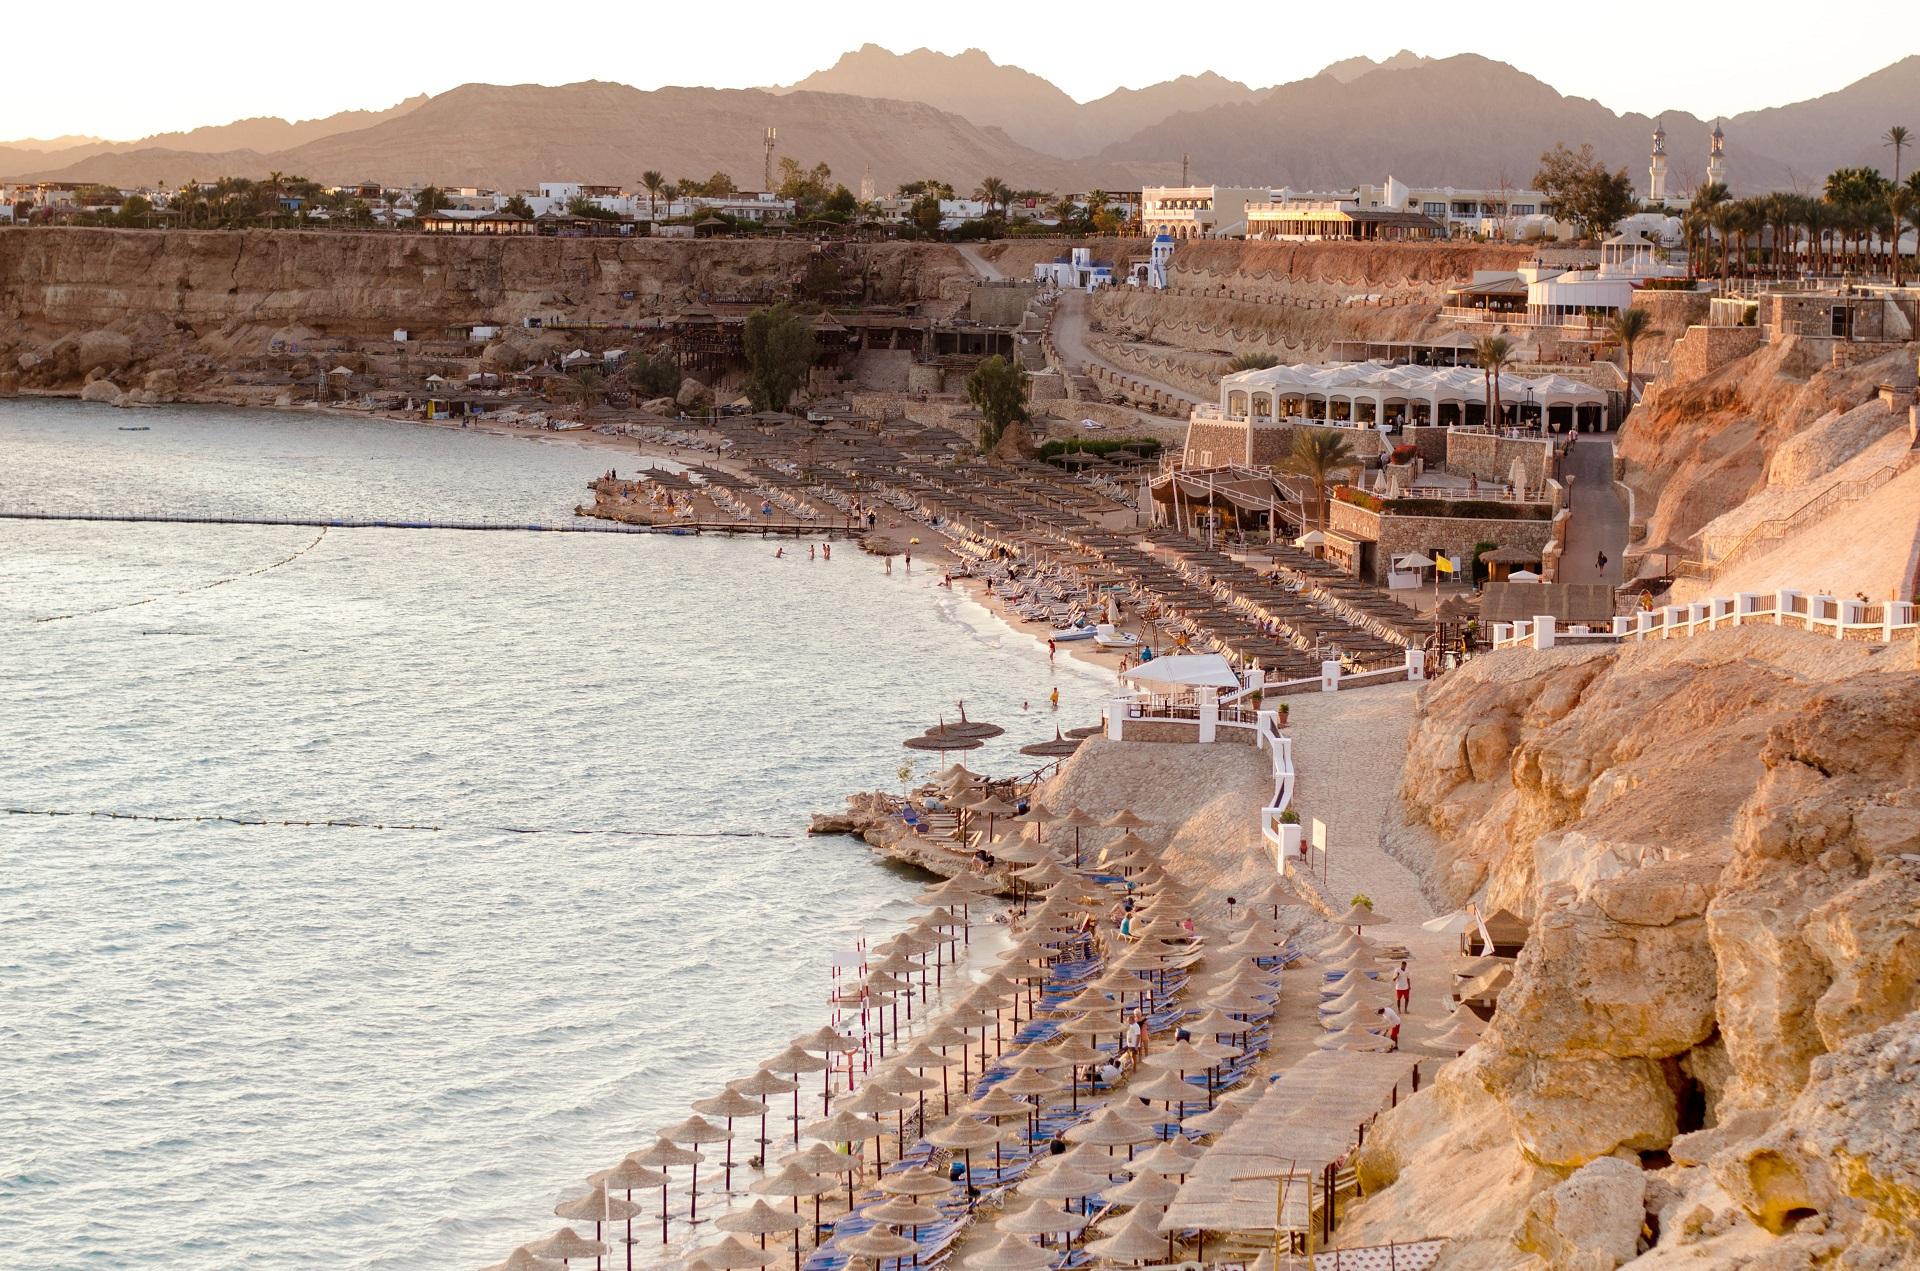 bright-sunset-luxury-hotels-coast-line-sharm-el-sheikh-south-sinai-egypt